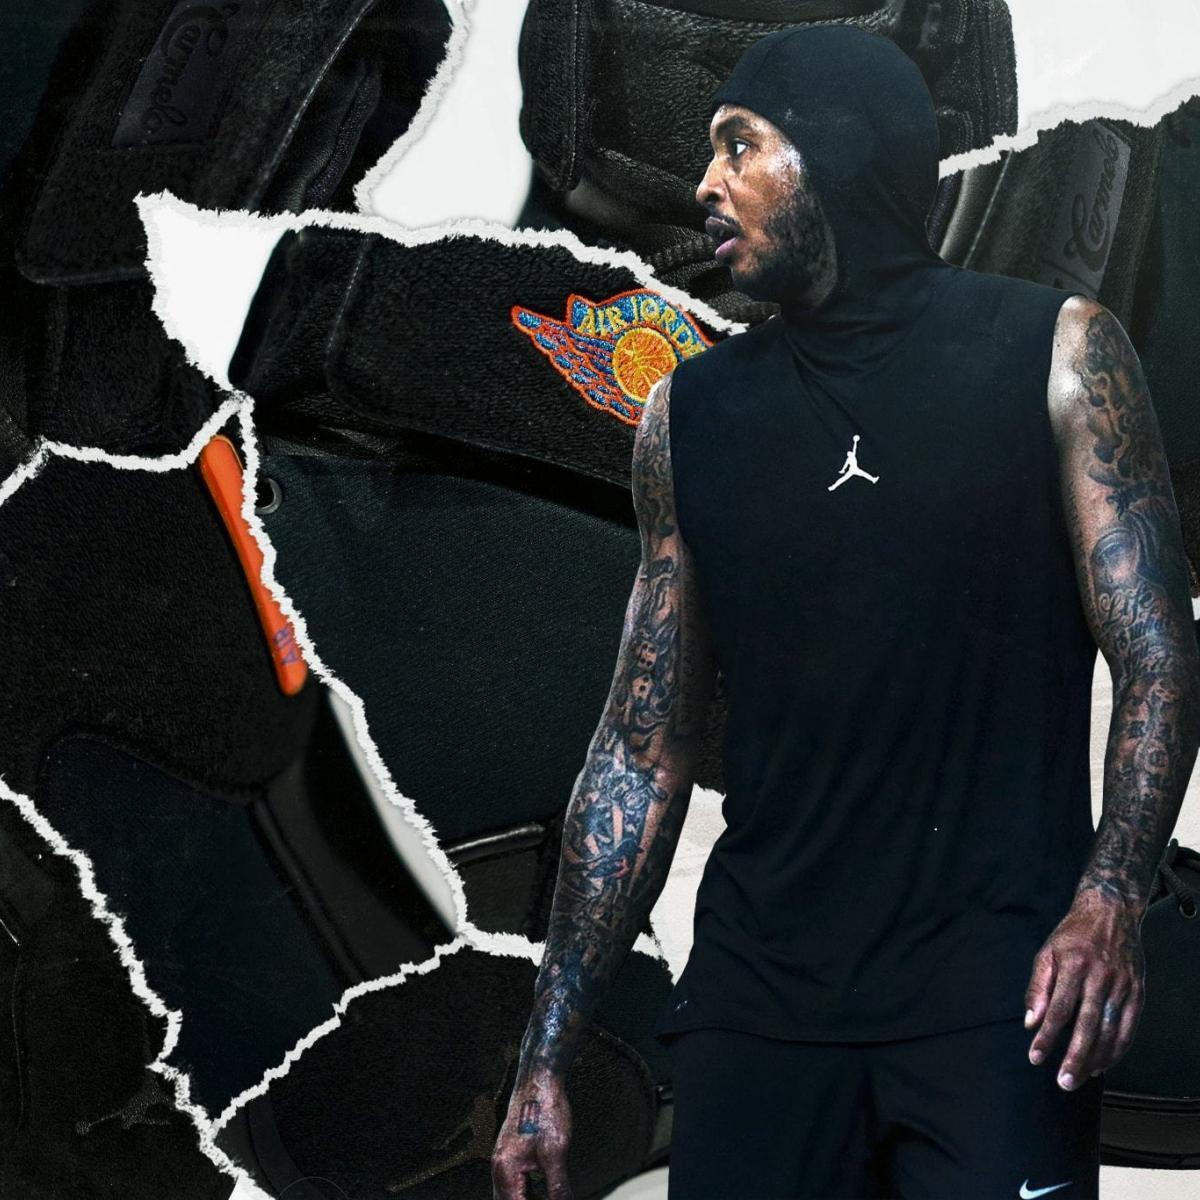 9a4b7d44d407 B R Kicks Exclusive  Carmelo Anthony s Return to the Jordan Melo 1.5 ...